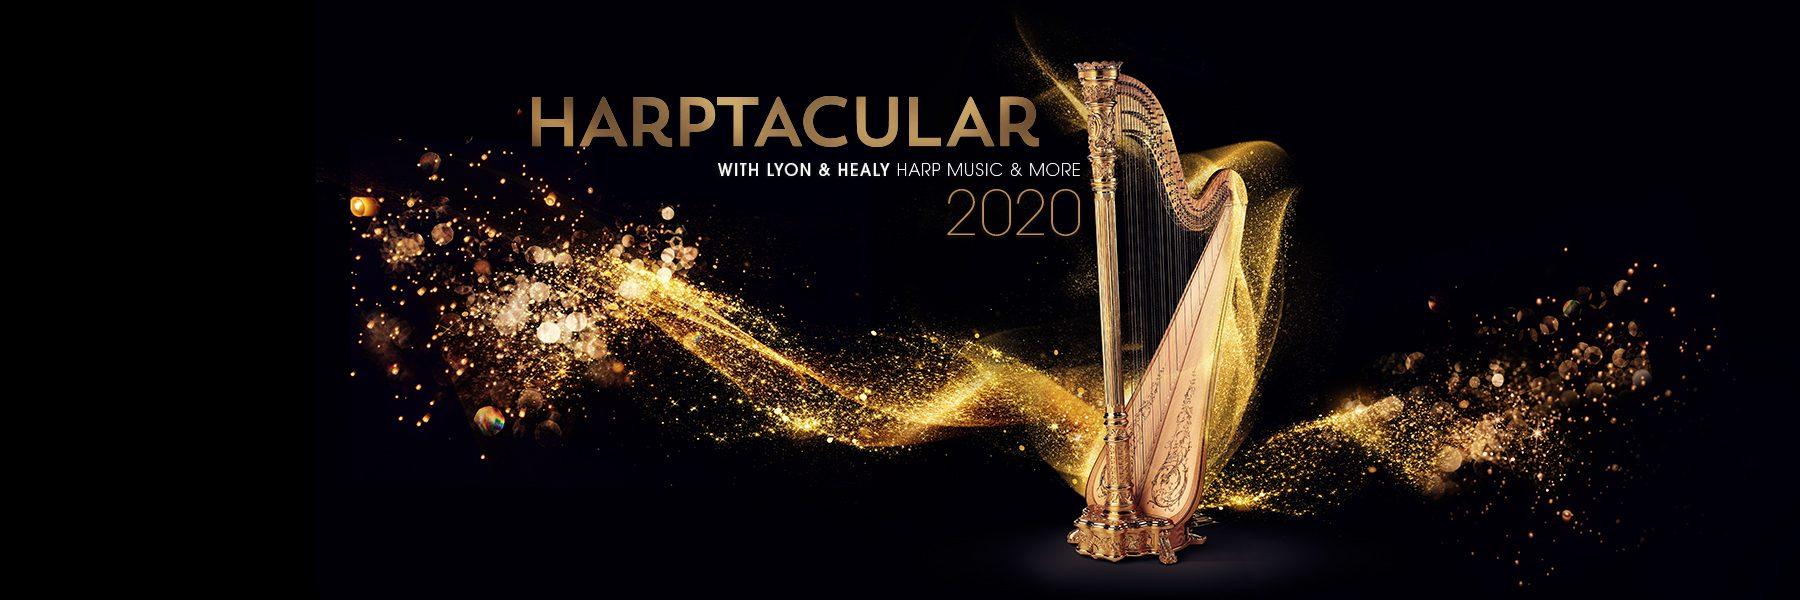 Harptacular